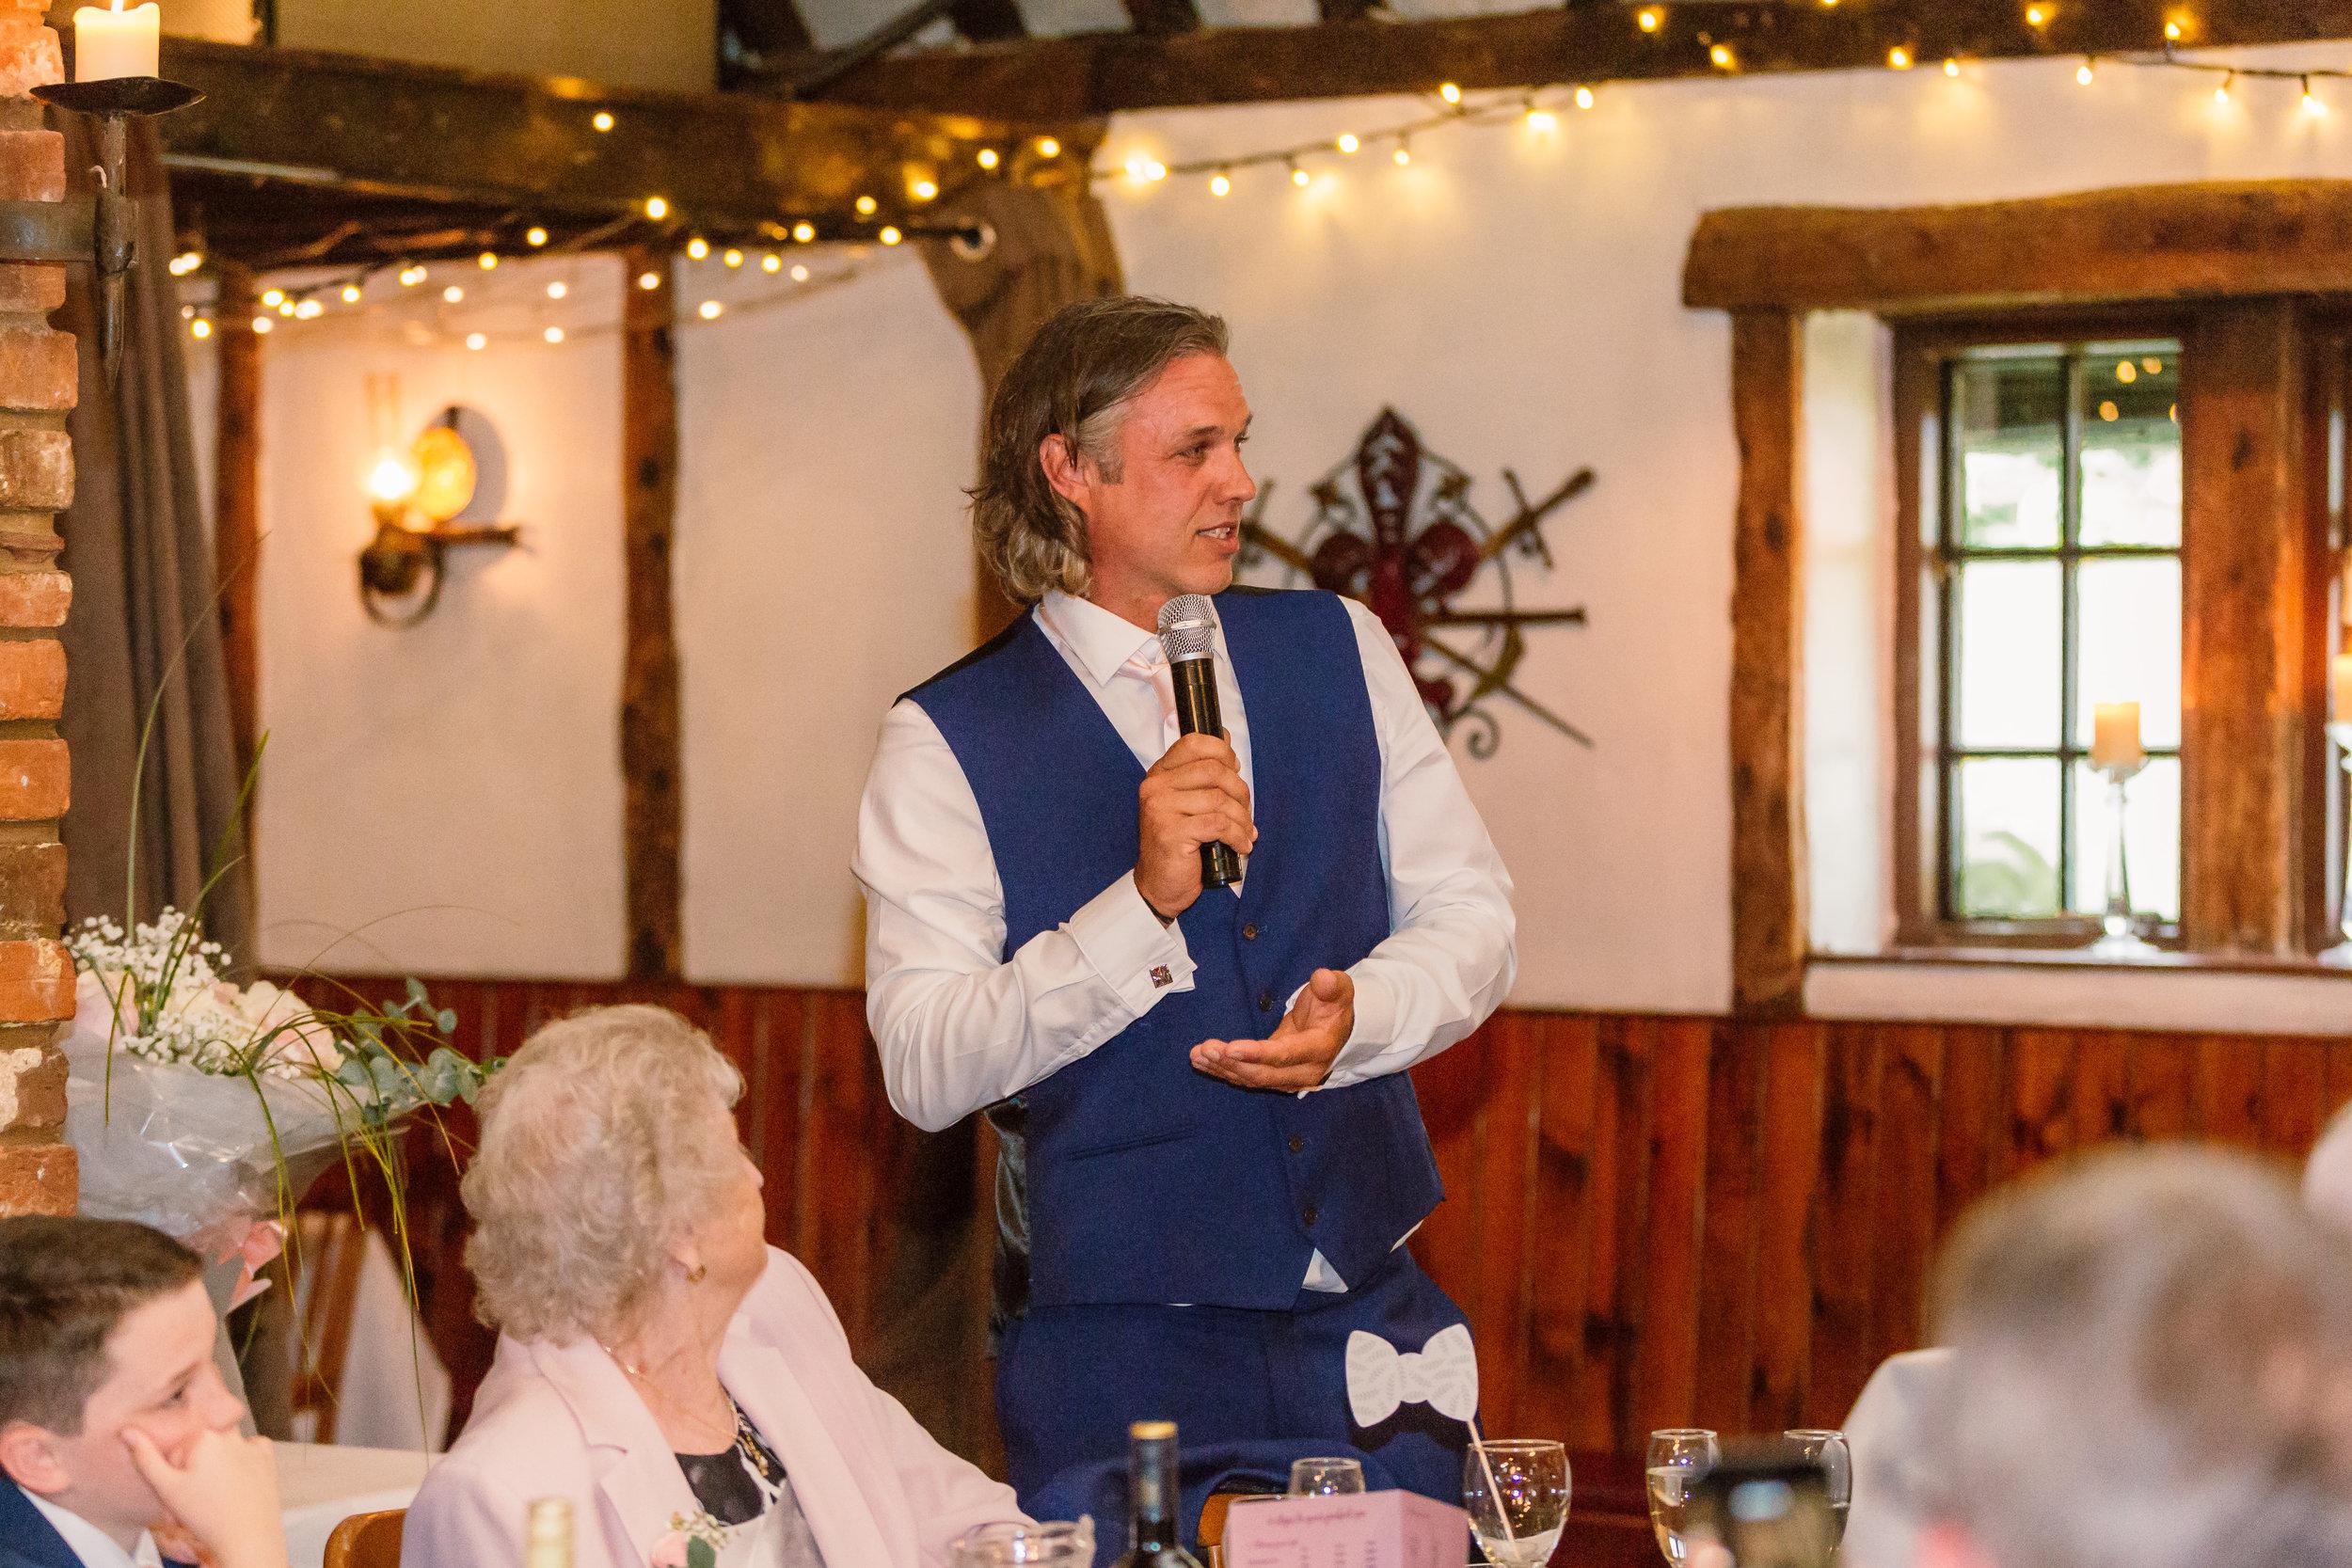 Sarah-Fishlock-Photography : Hampshire-wedding-photographer-hampshire : fleet-wedding-photographer-fleet : Meade-Hall-Wedding-Photographer : Meade-Hall-Wedding-Photos-914.jpg